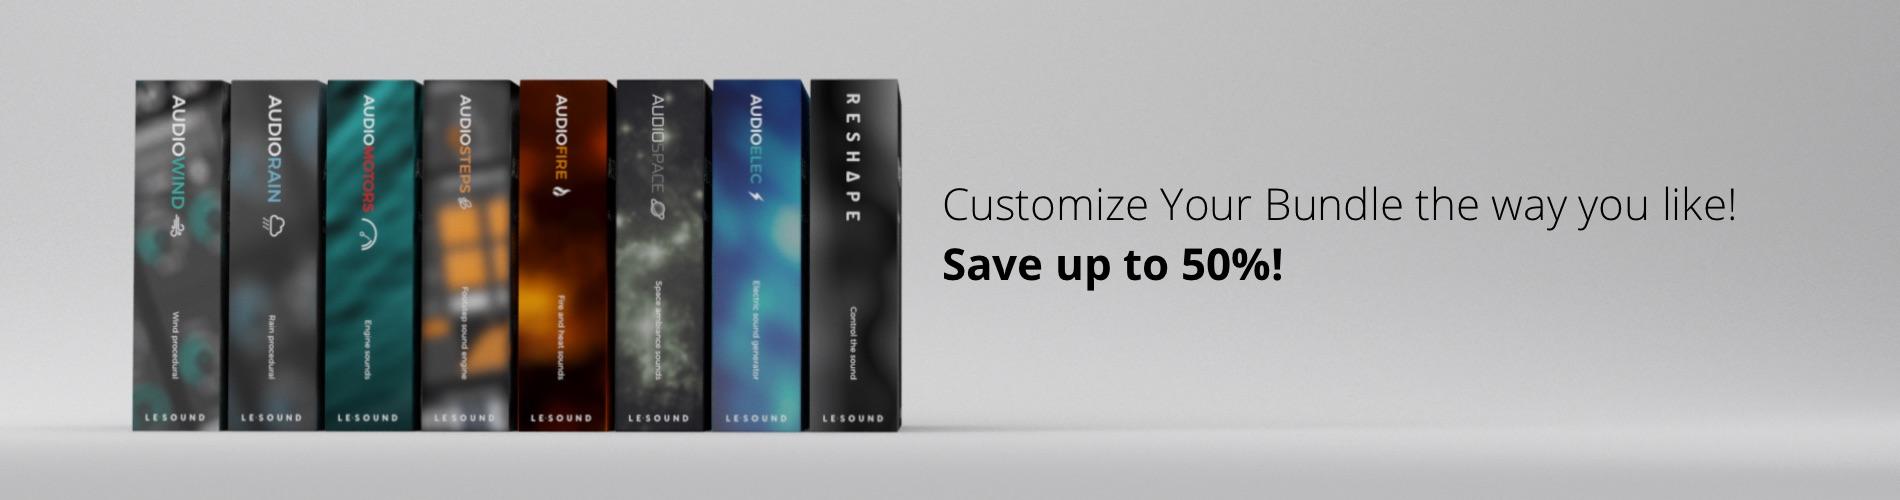 Banner_customize_your_bundle